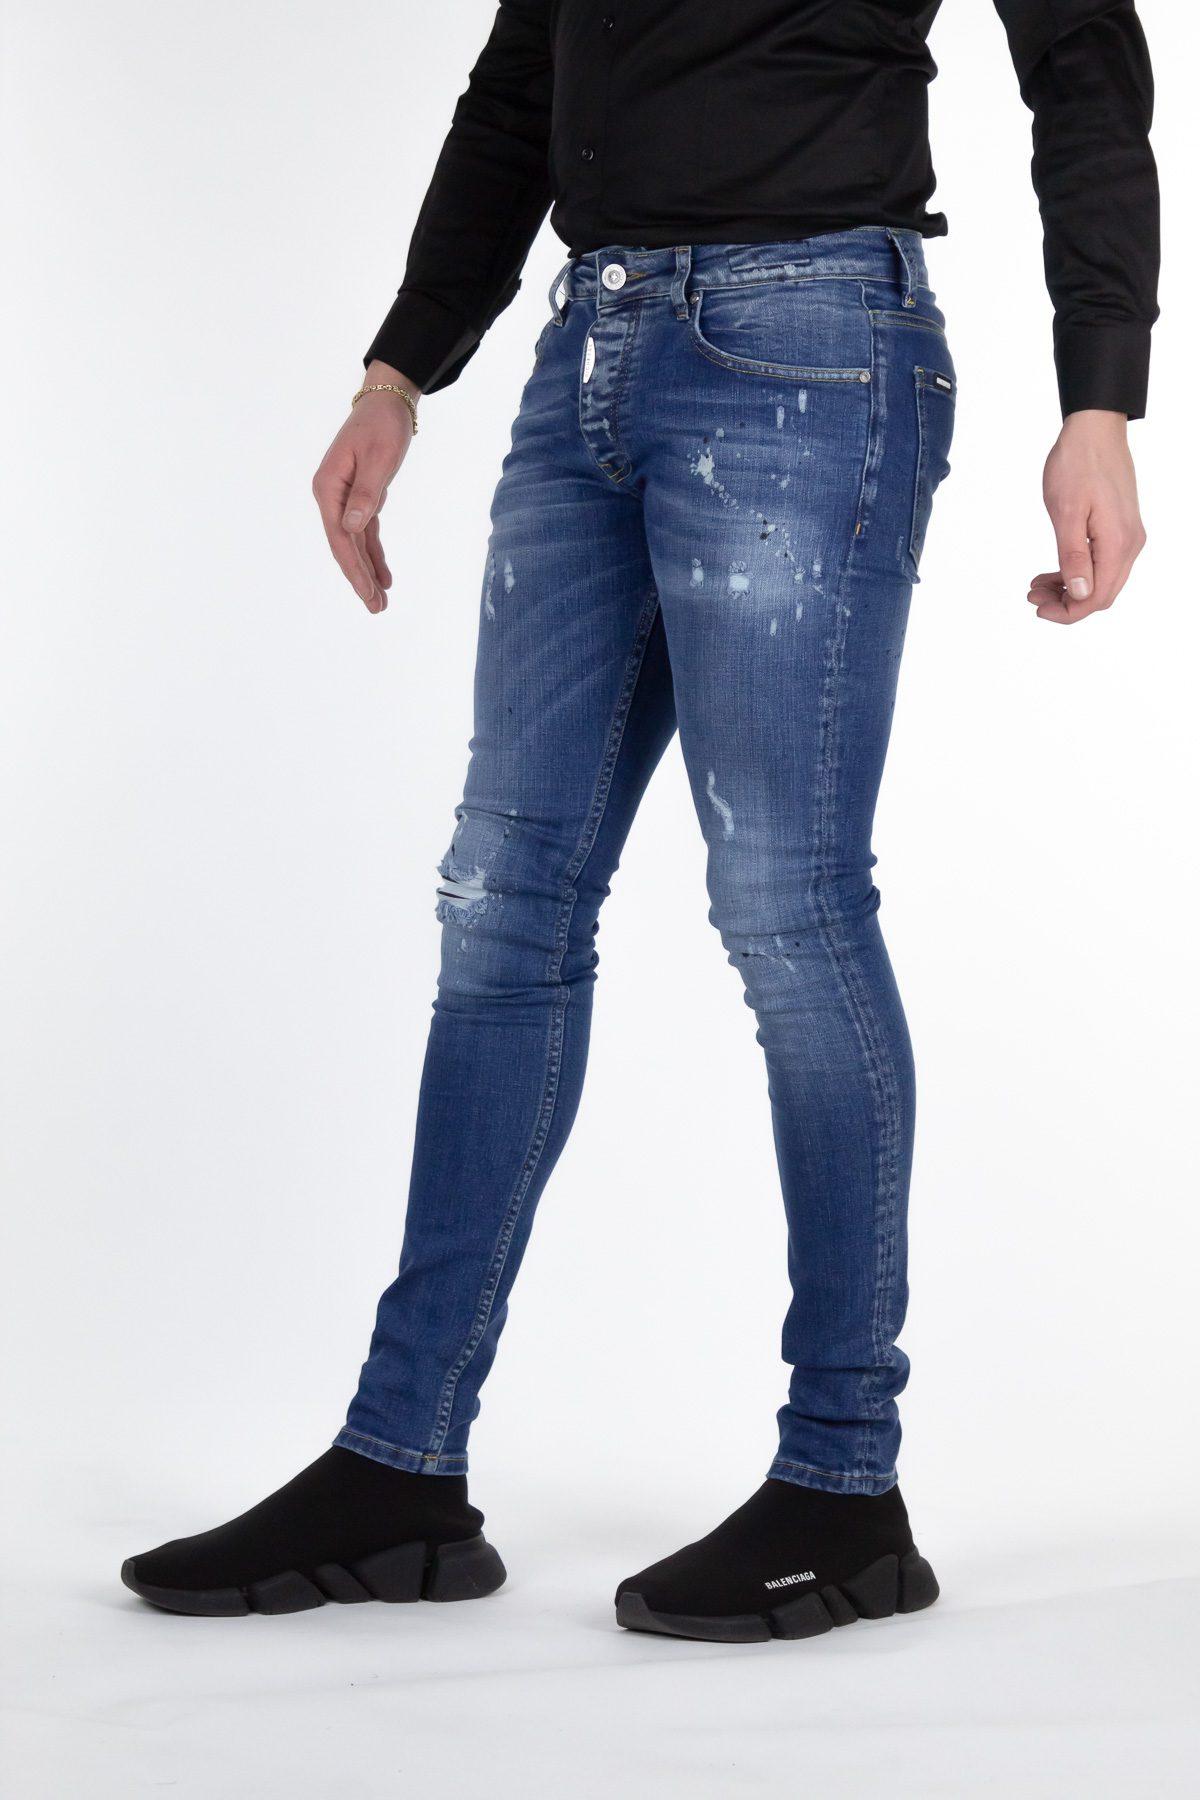 Richesse Milan Blue Jeans 2237-2